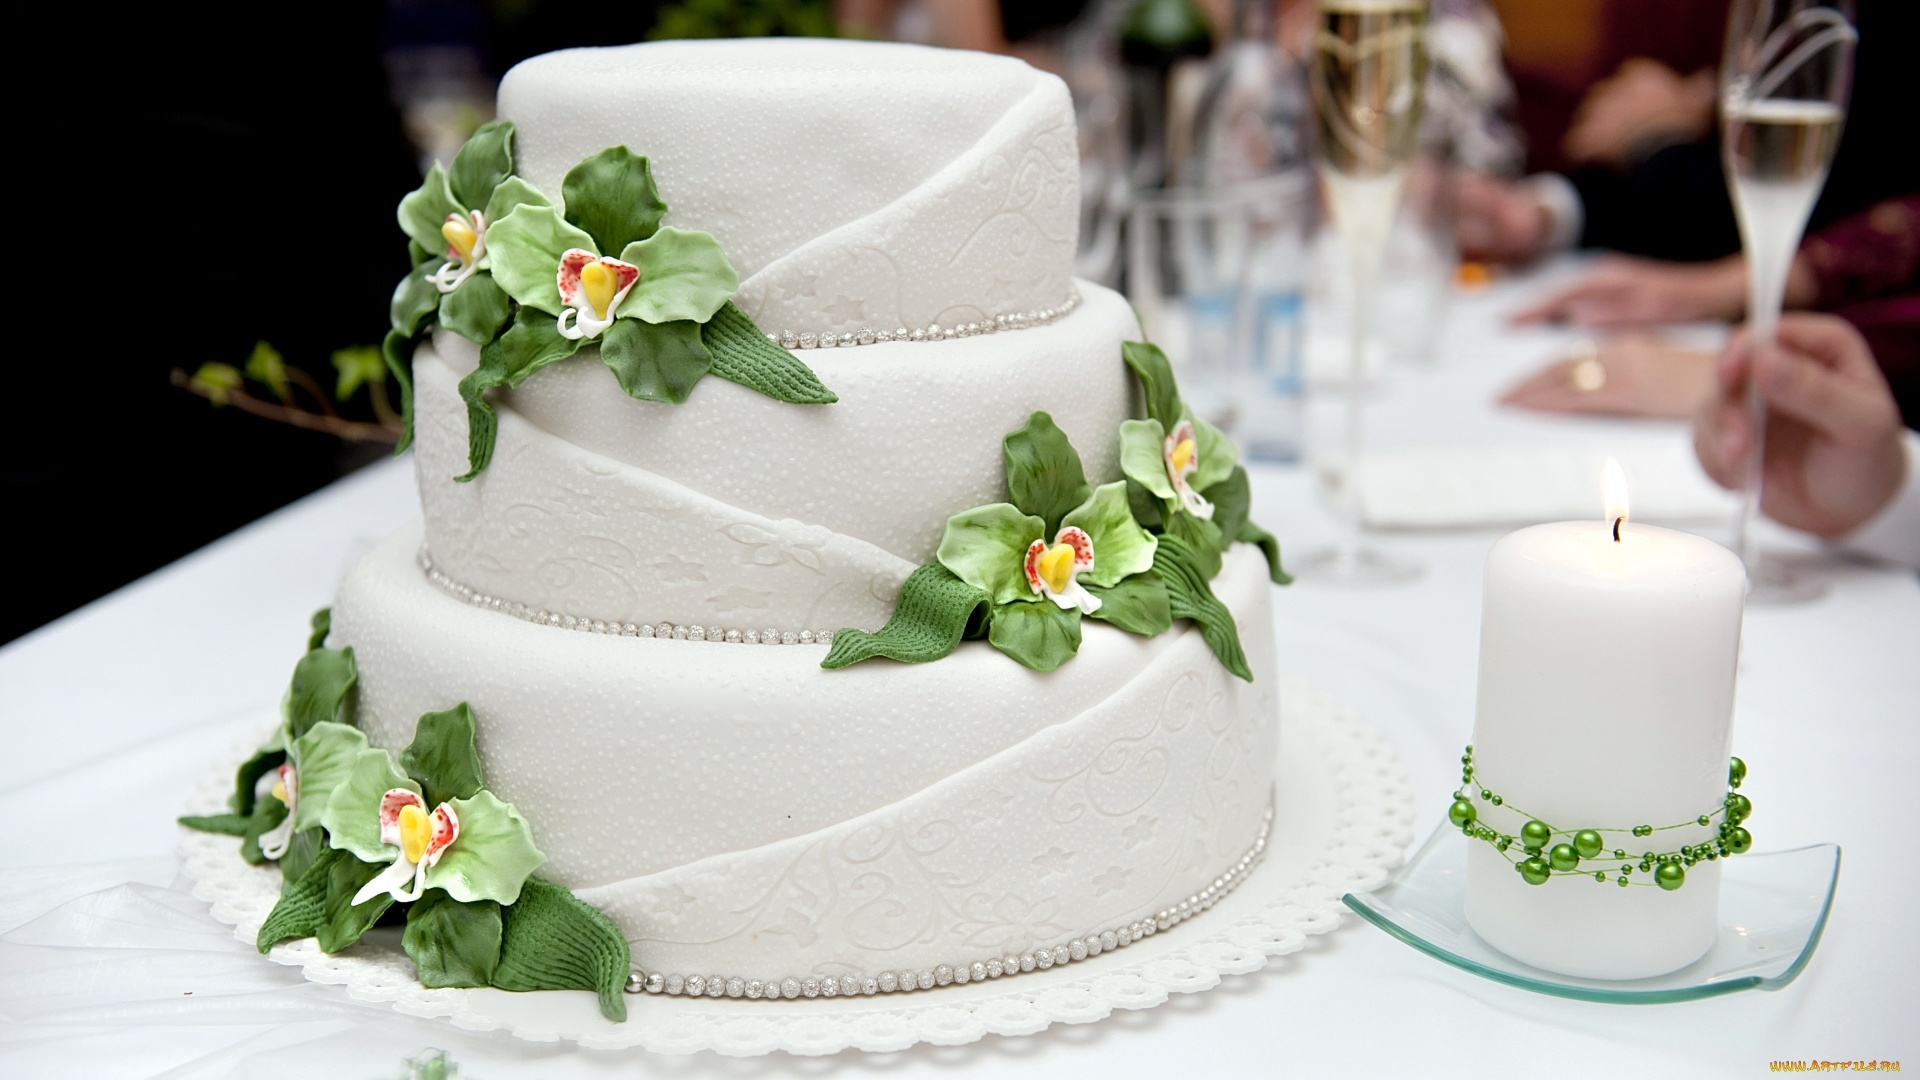 Wedding Cake desktop wallpaper hd